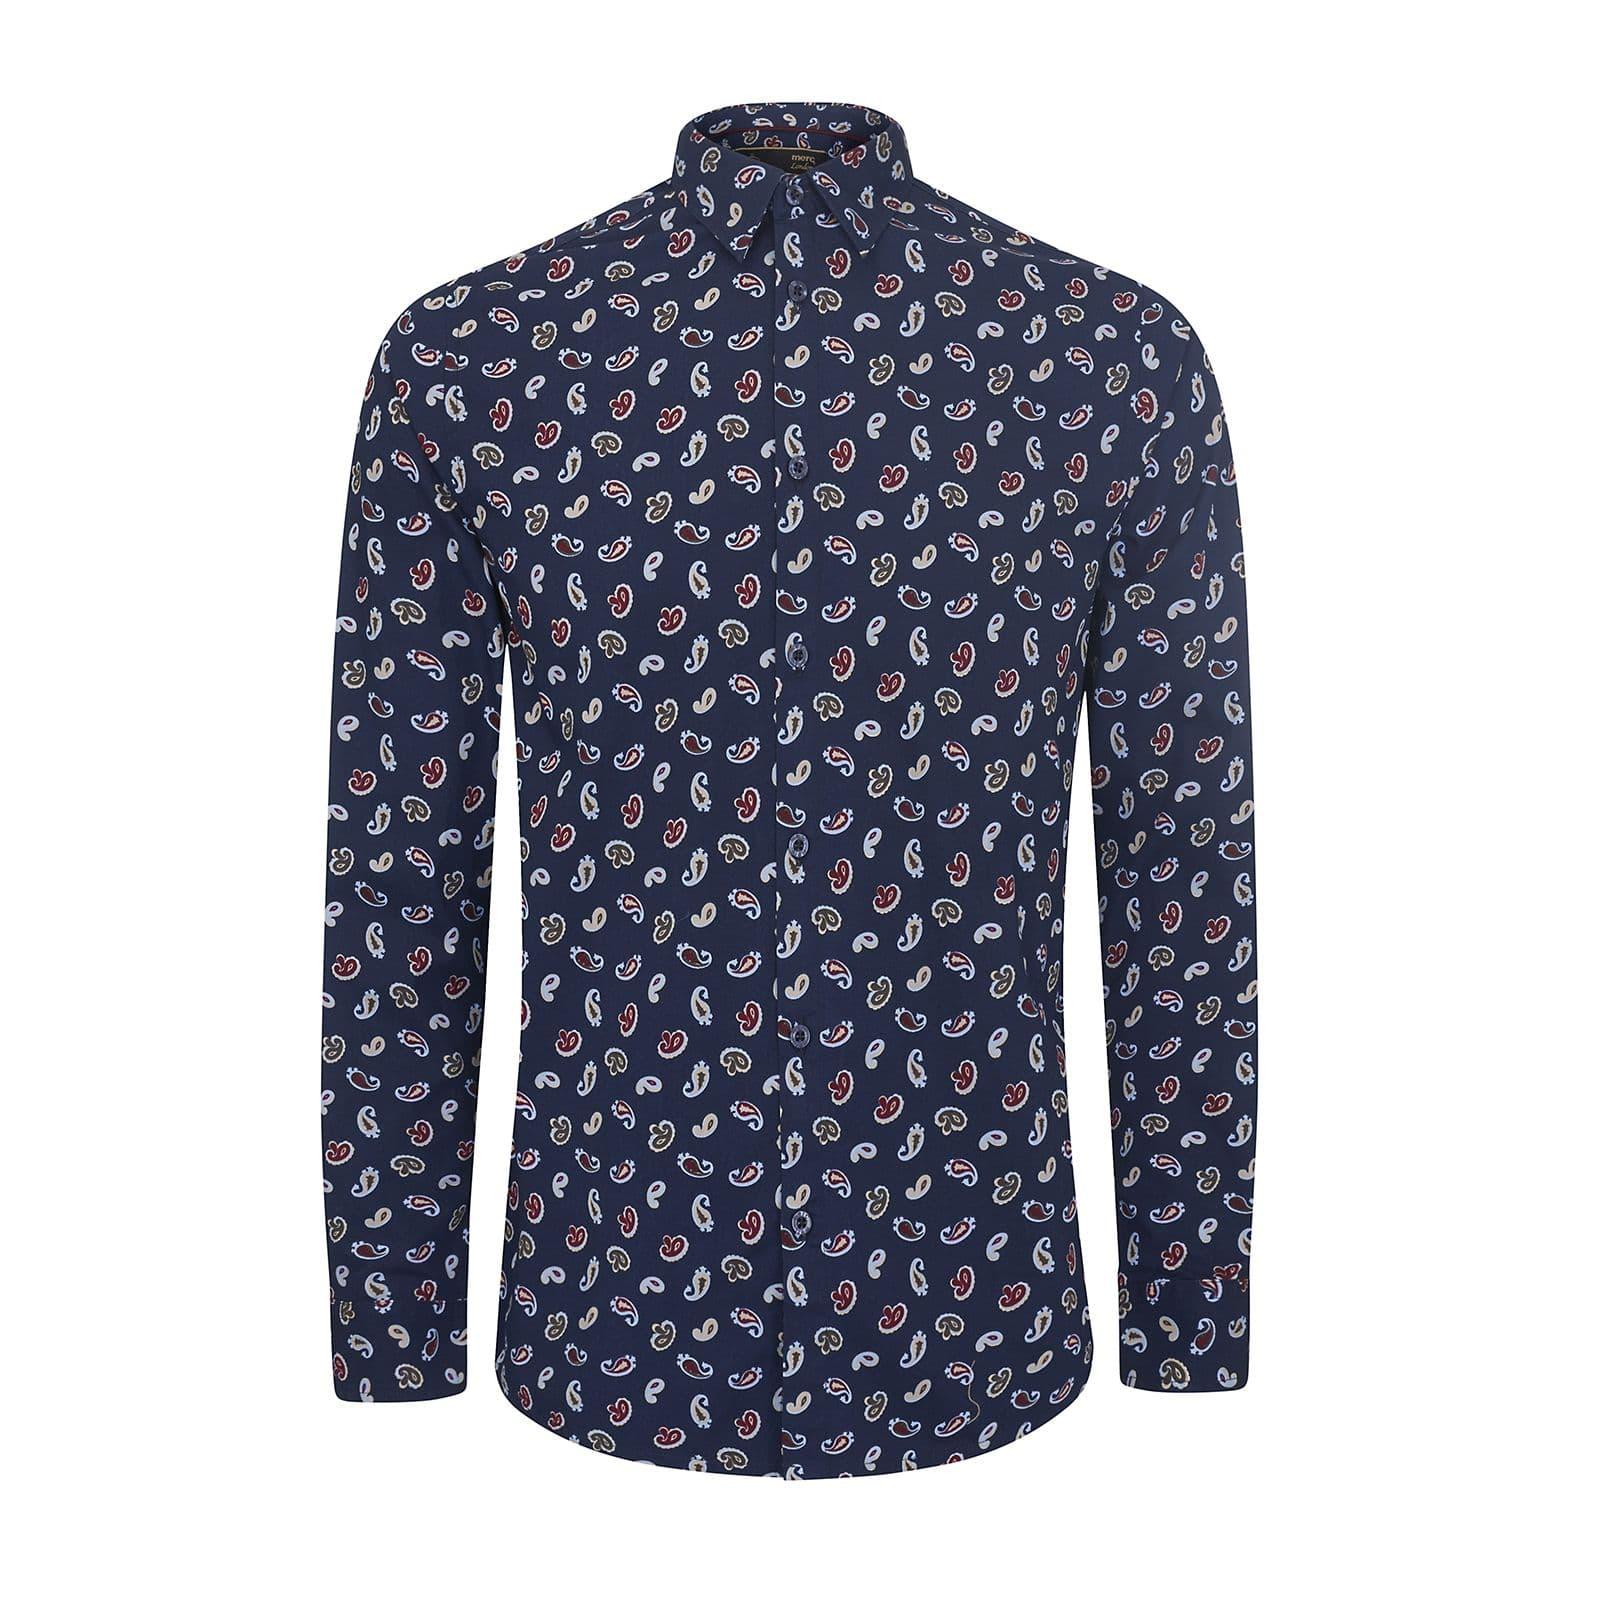 Рубашка AlanРубашки под заказ<br><br><br>Артикул: 1517201<br>Материал: 100% хлопок<br>Цвет: синий<br>Пол: Мужской